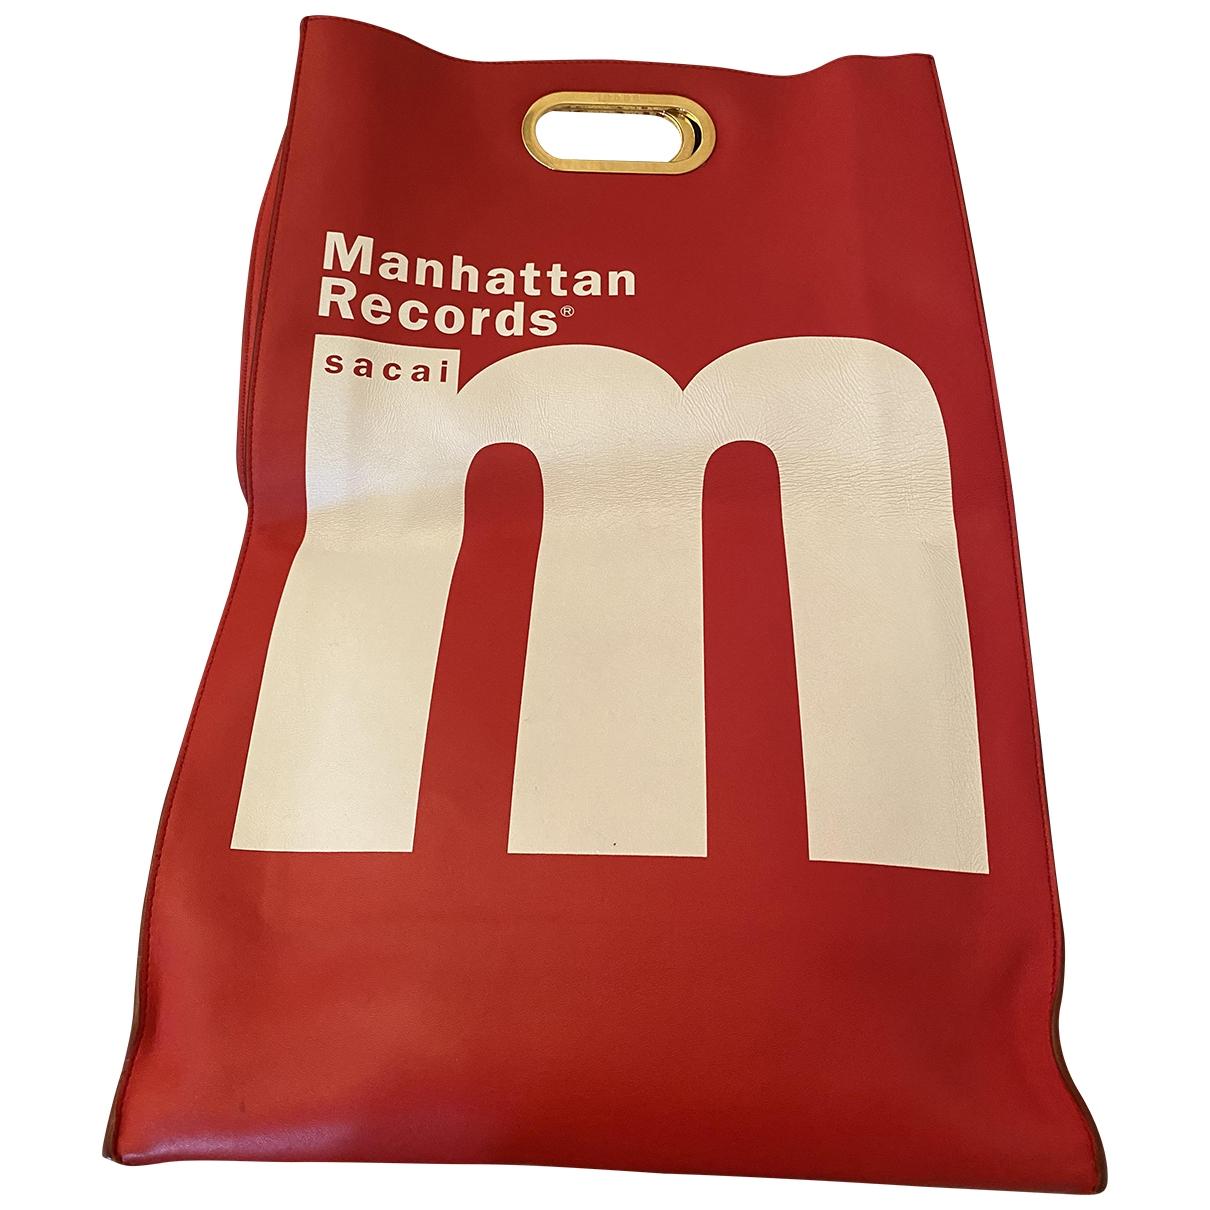 Sacai \N Red Leather handbag for Women \N